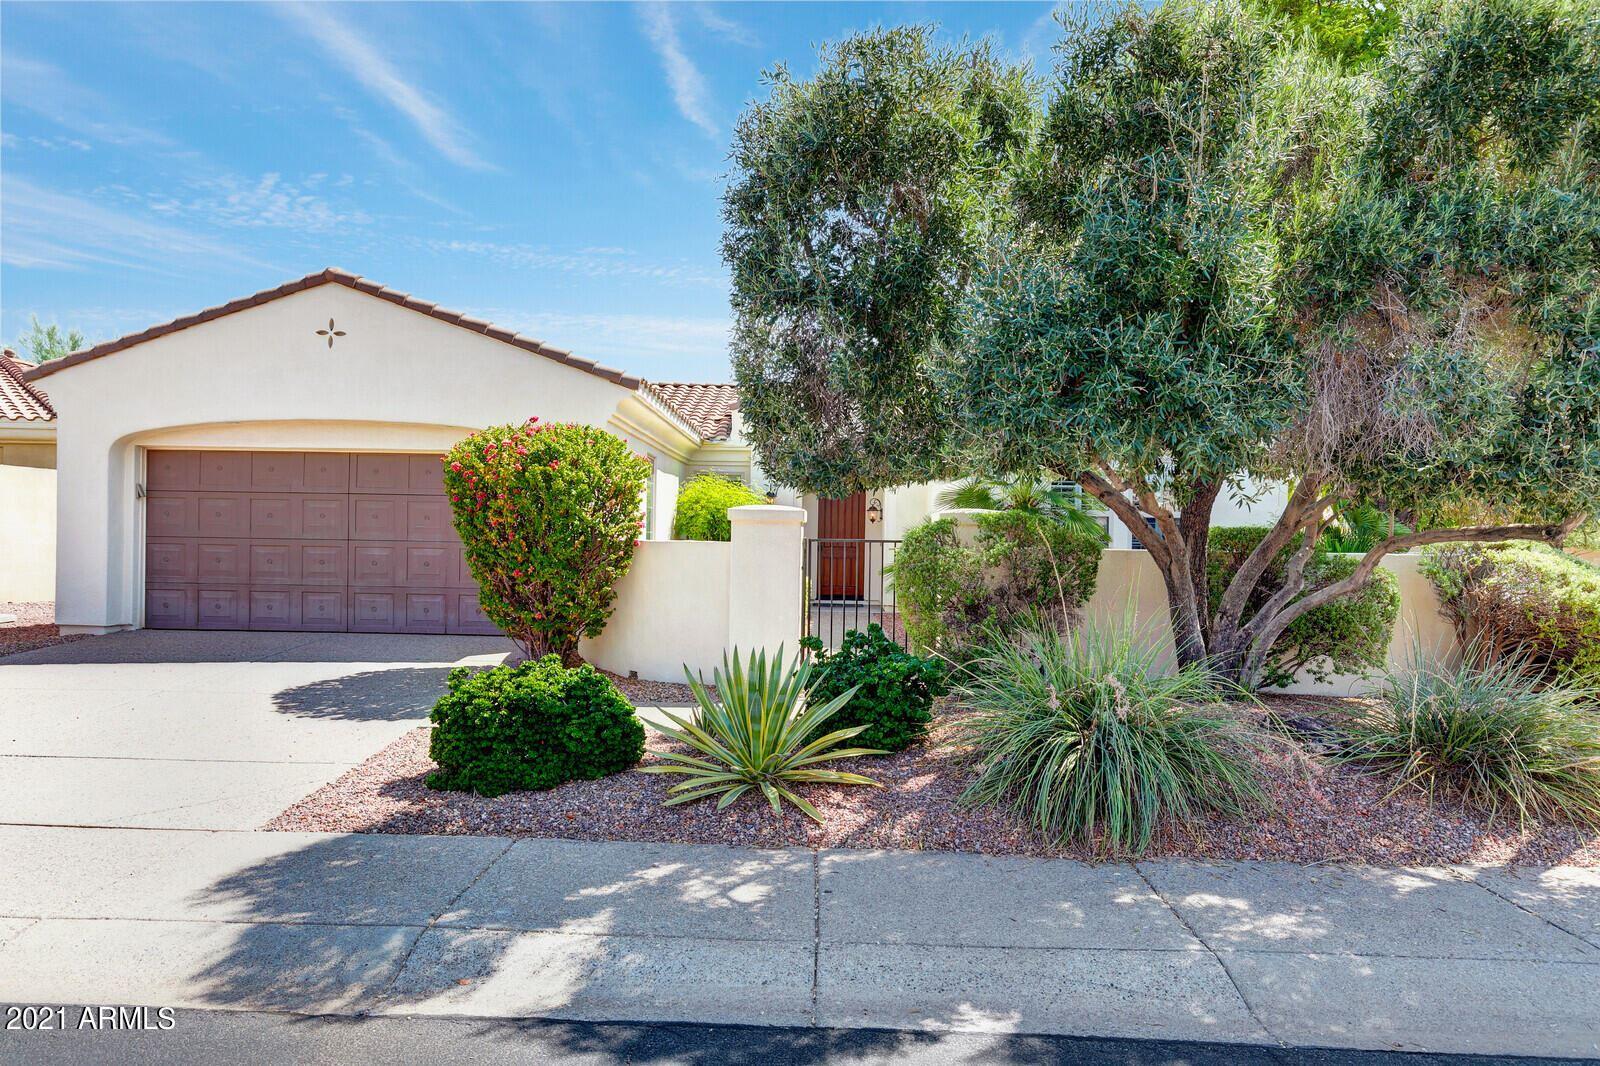 22619 N LAS POSITAS Drive, Sun City West, AZ 85375 - MLS#: 6290716